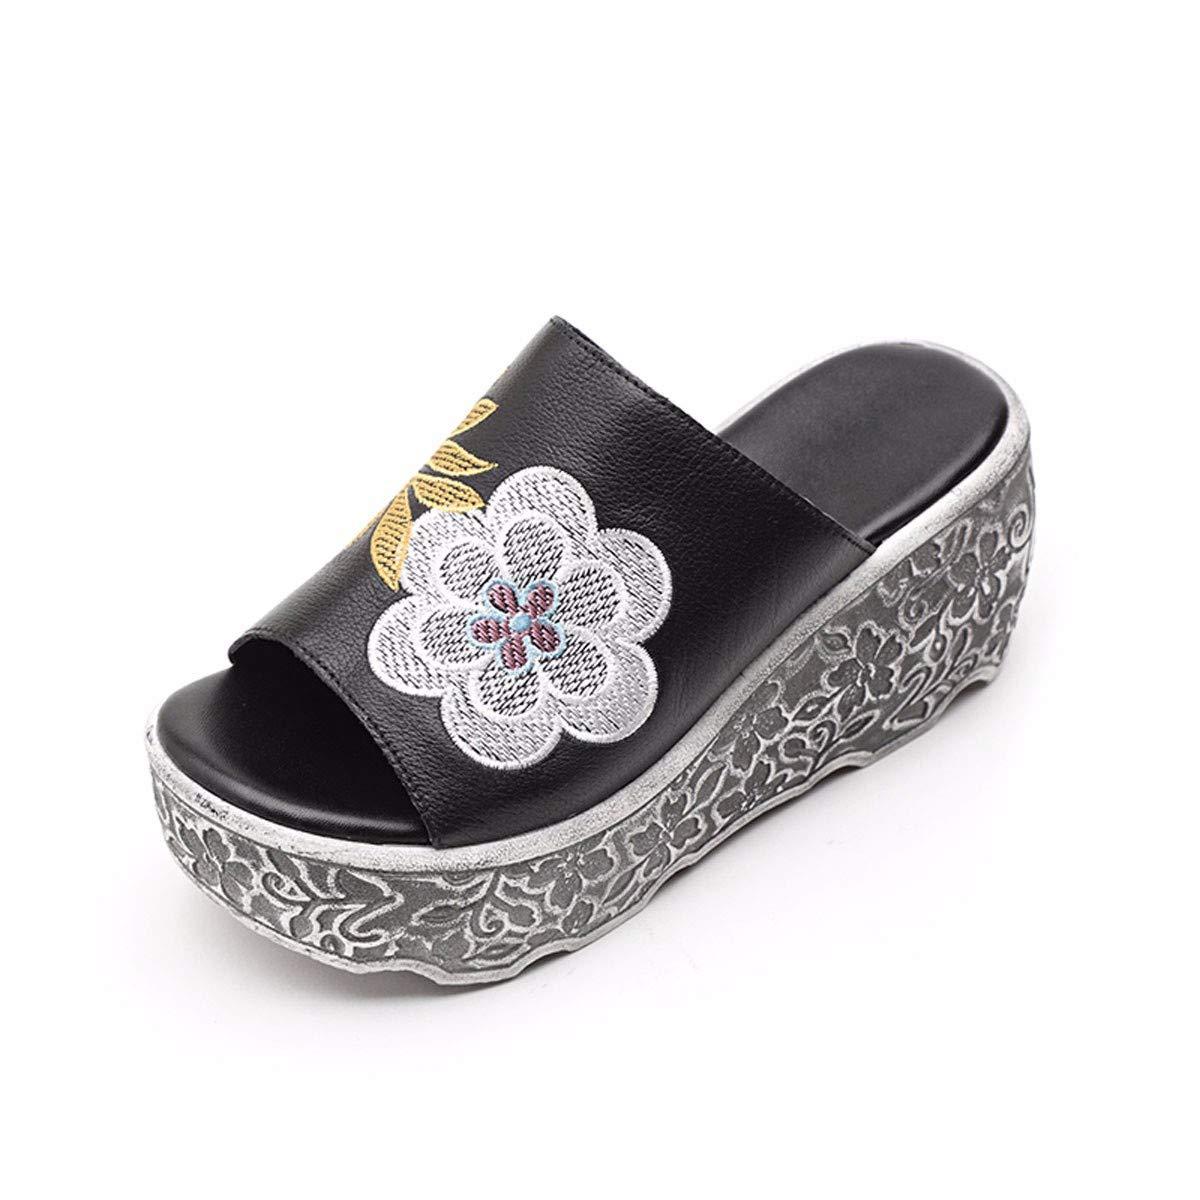 KPHY Damenschuhe Sandalen Schuhe Leder-Slipper Sommer-Mode Ein Outwear 8 cm High Heels Ein Sommer-Mode Schuh Dicke Boden-Piste-Heels 35 Schwarz ea8d89